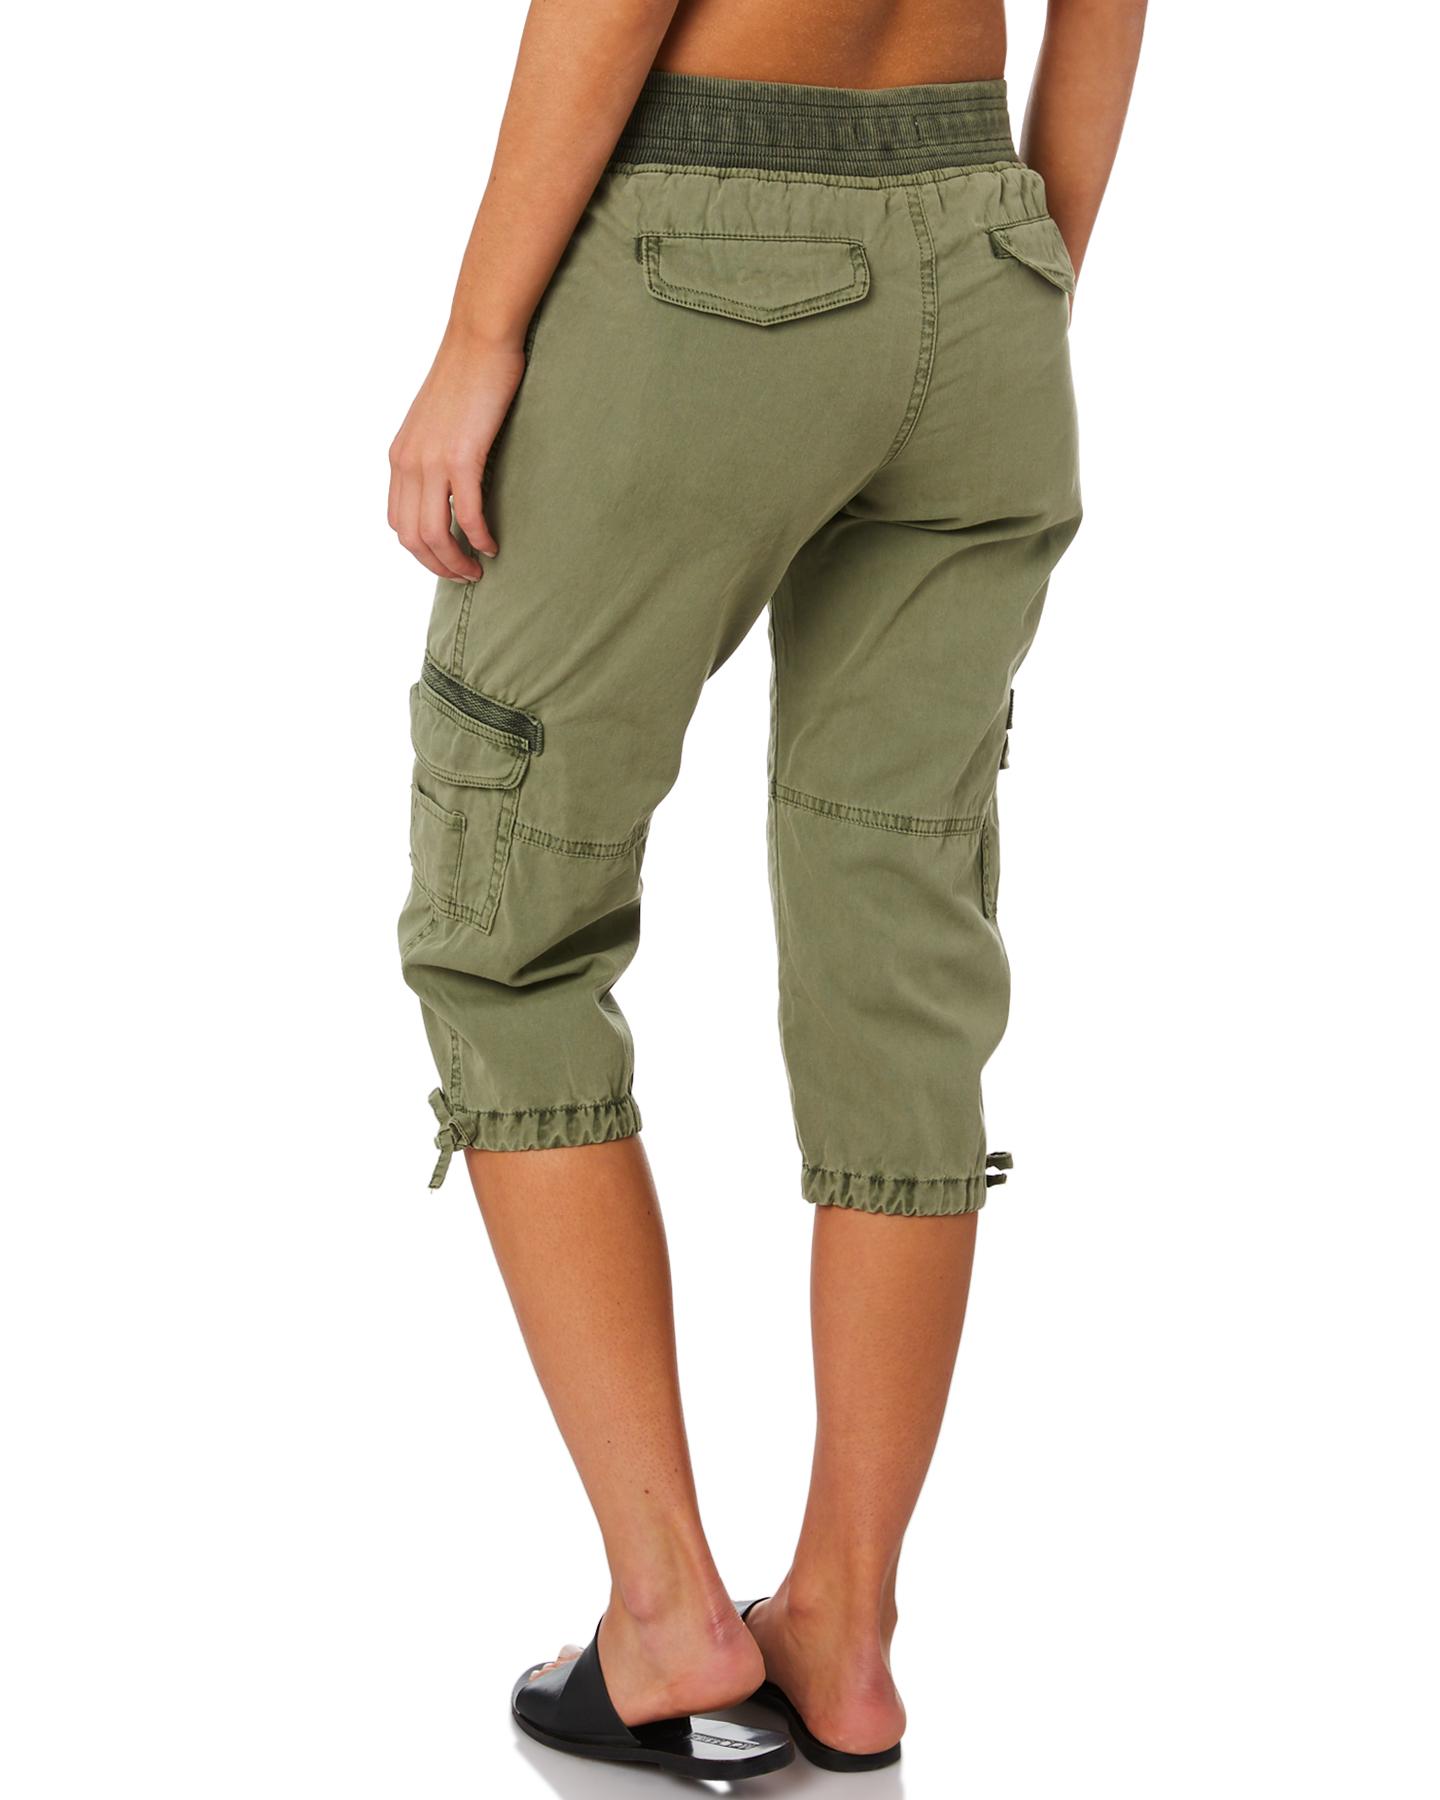 New-Swell-Women-039-s-Mayfair-3-4-Cargo-Pant-Cotton-Green thumbnail 8